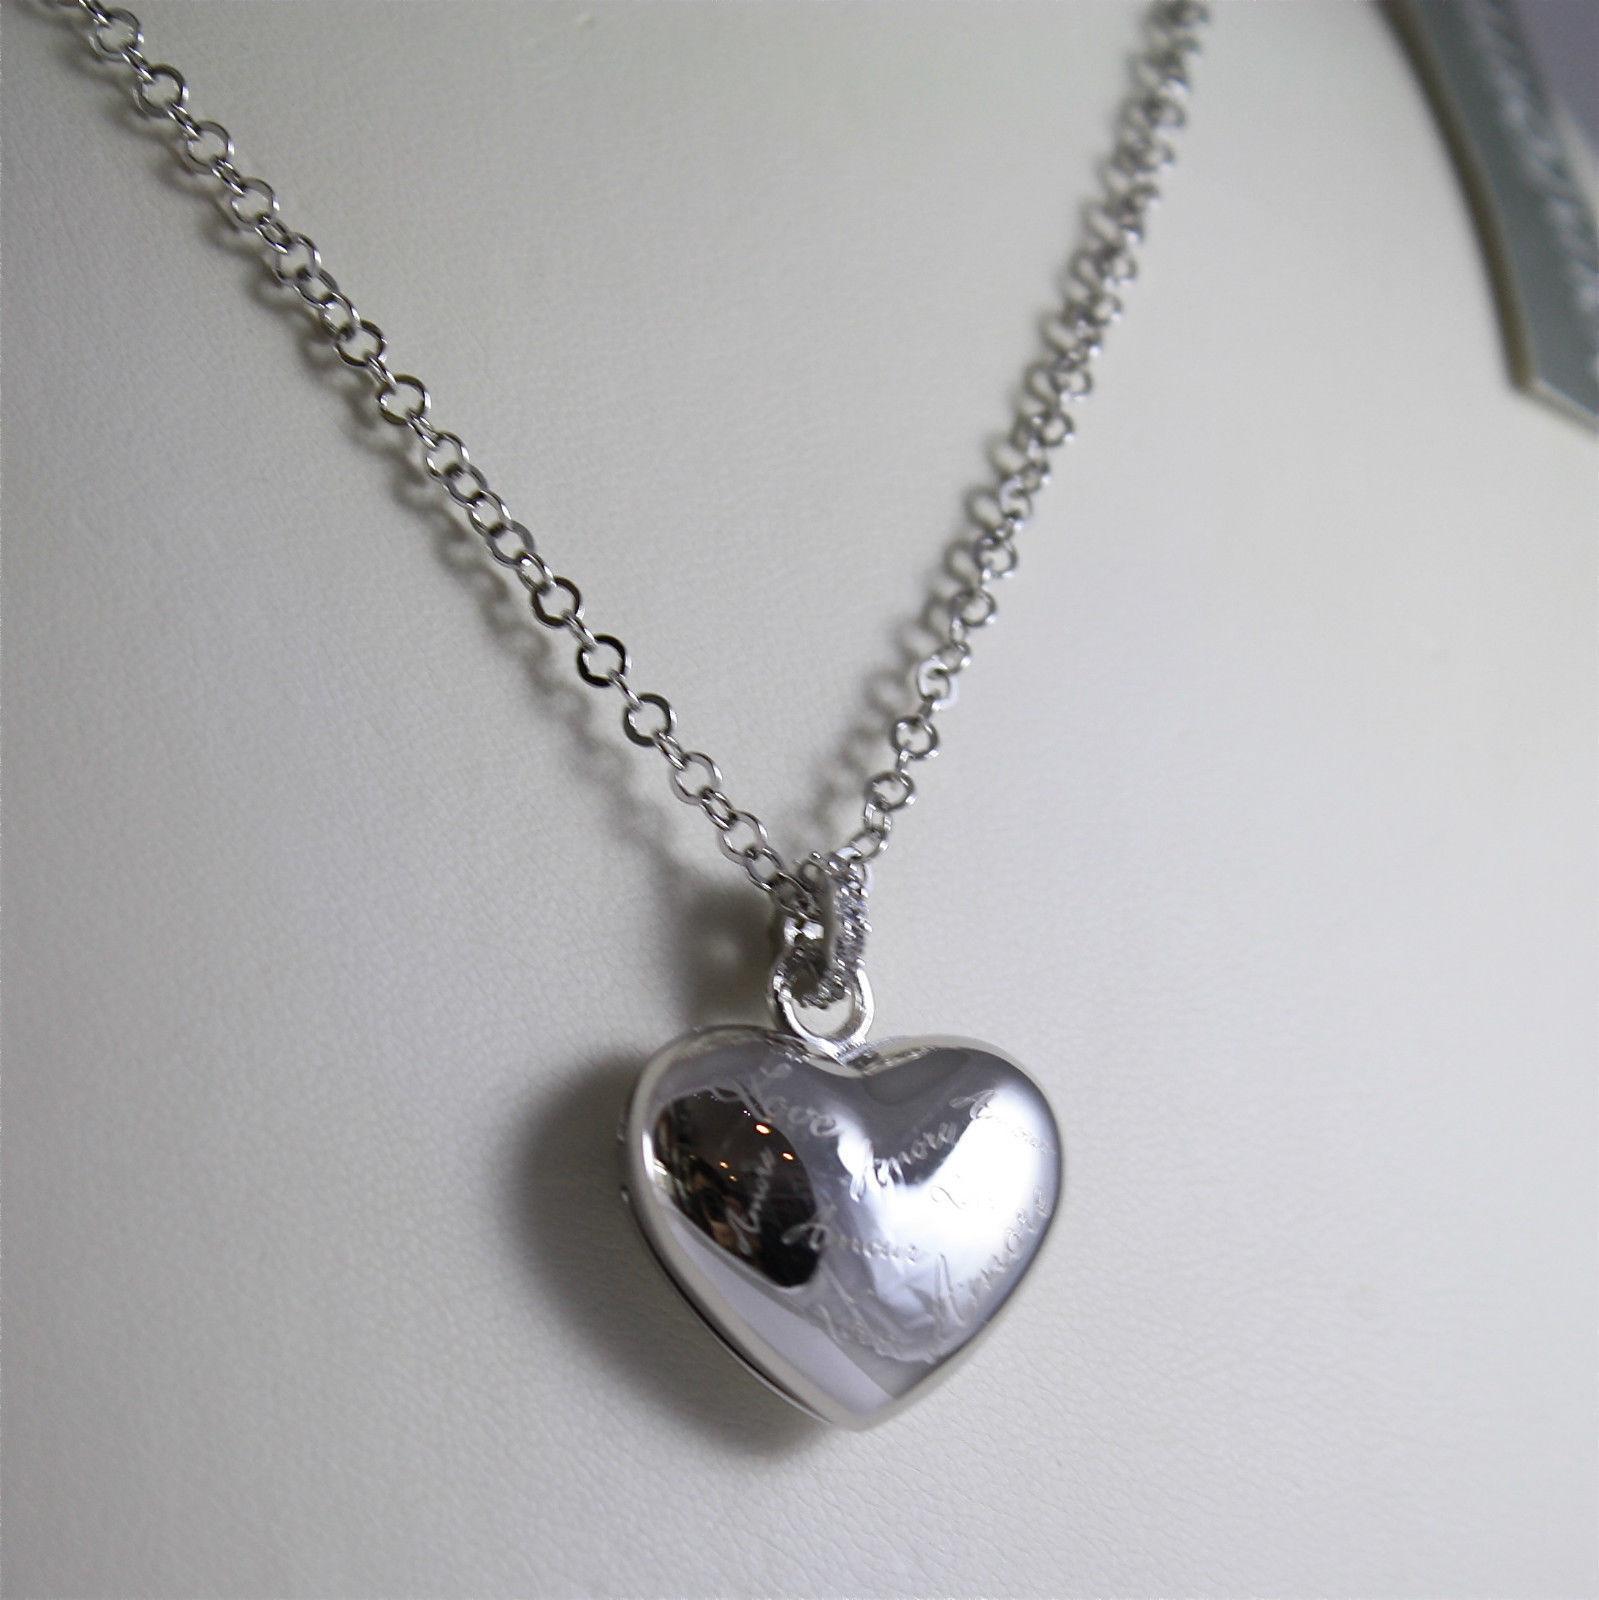 925 SILVER, AQUAFORTE NECKLACE, RHODIUM TREATMENT, SECRET-HEART CHARM